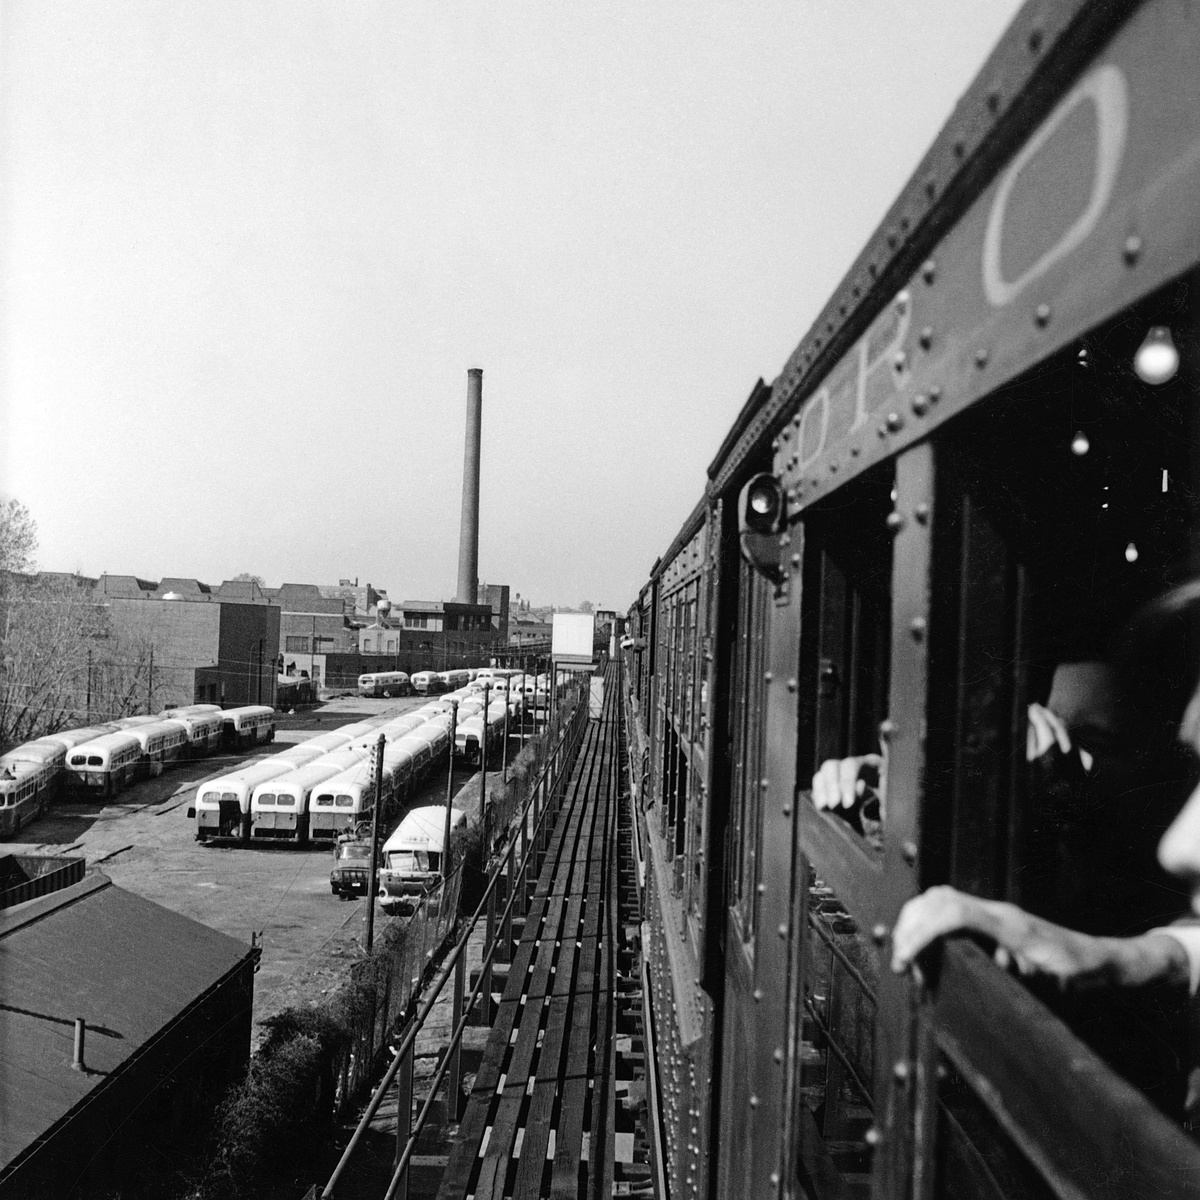 (511k, 1200x1200)<br><b>Country:</b> United States<br><b>City:</b> New York<br><b>System:</b> New York City Transit<br><b>Line:</b> BMT Culver Line<br><b>Location:</b> Avenue X<br><b>Route:</b> Fan Trip<br><b>Car:</b> Low-V (Museum Train)  <br><b>Collection of:</b> David Pirmann<br><b>Date:</b> 4/6/1968<br><b>Viewed (this week/total):</b> 0 / 342